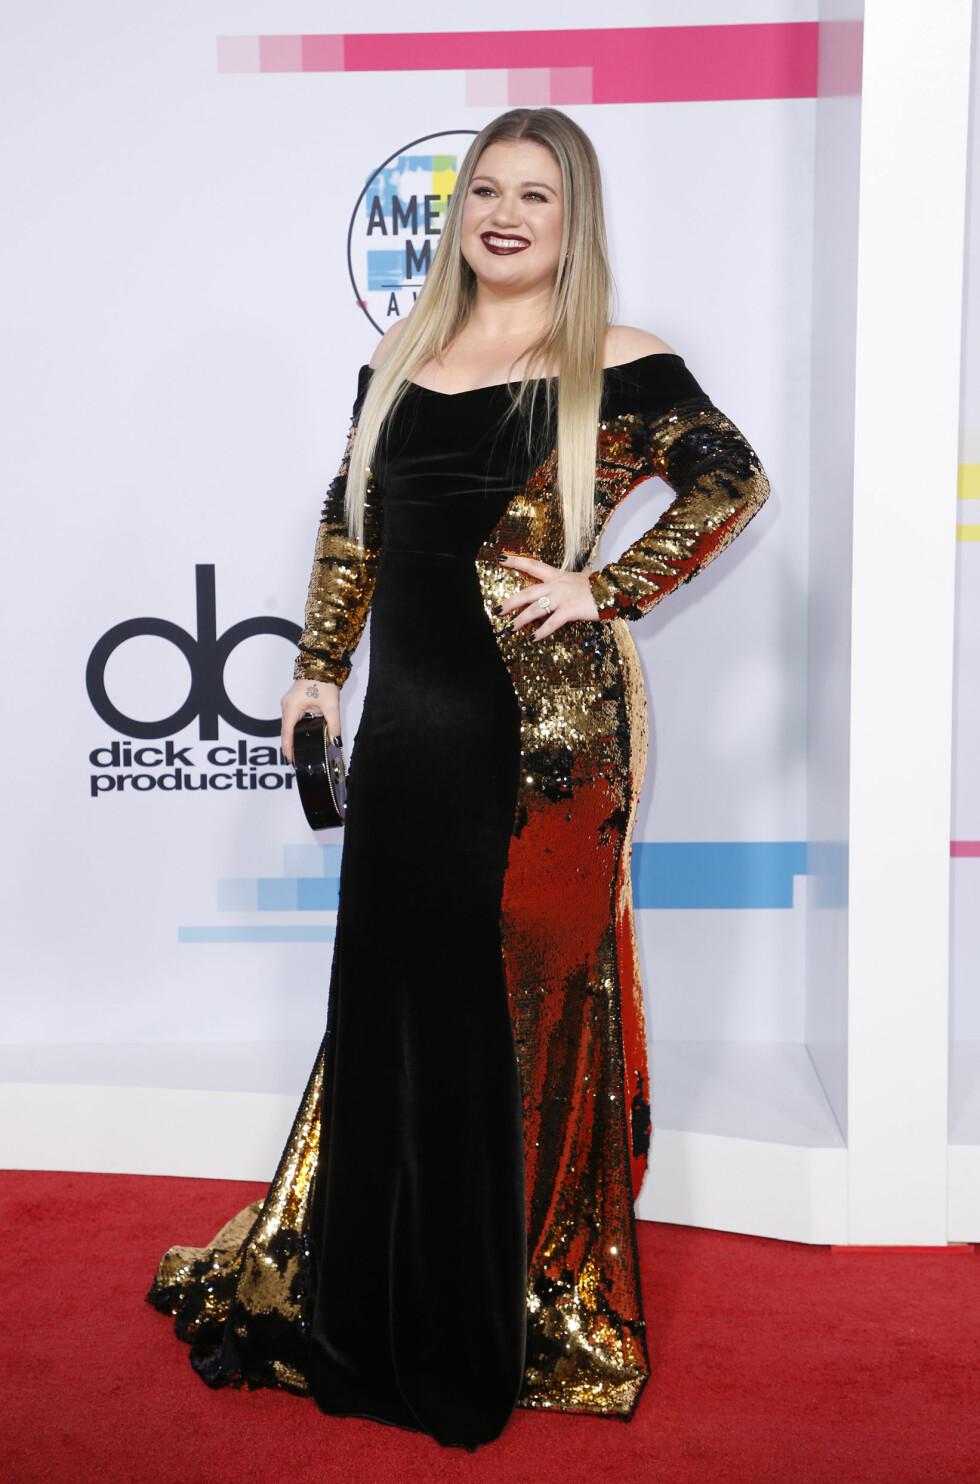 AMERICAN MUSIC AWARDS: Kelly Clarkson